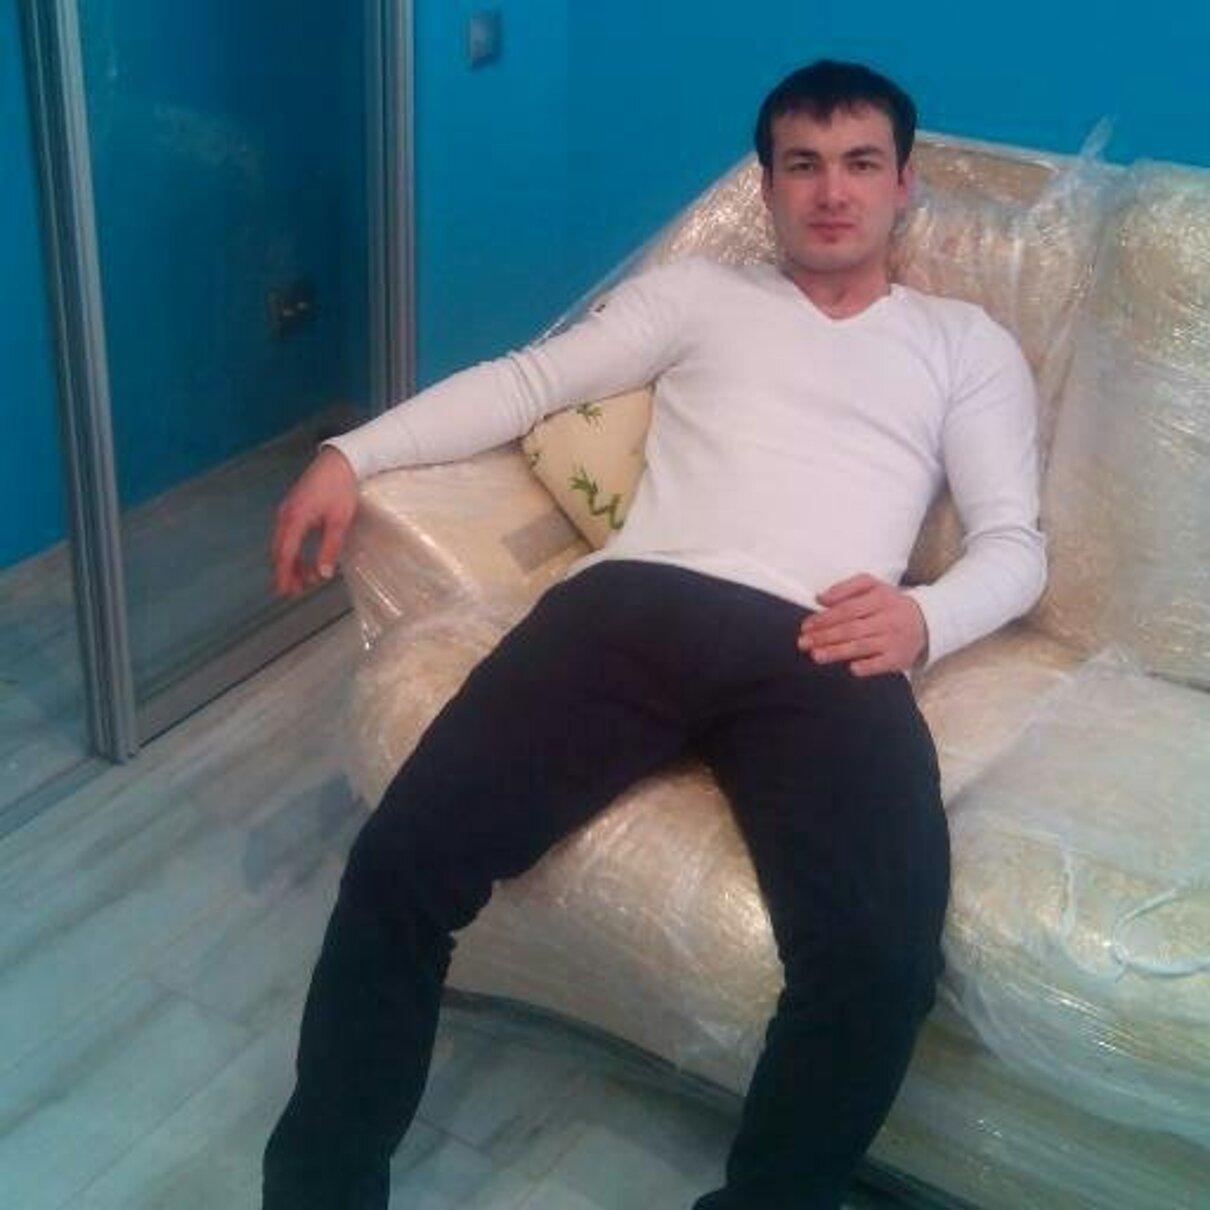 Жалоба-отзыв: Махмут - Не исправляет косяки после ремонта.  Фото №2